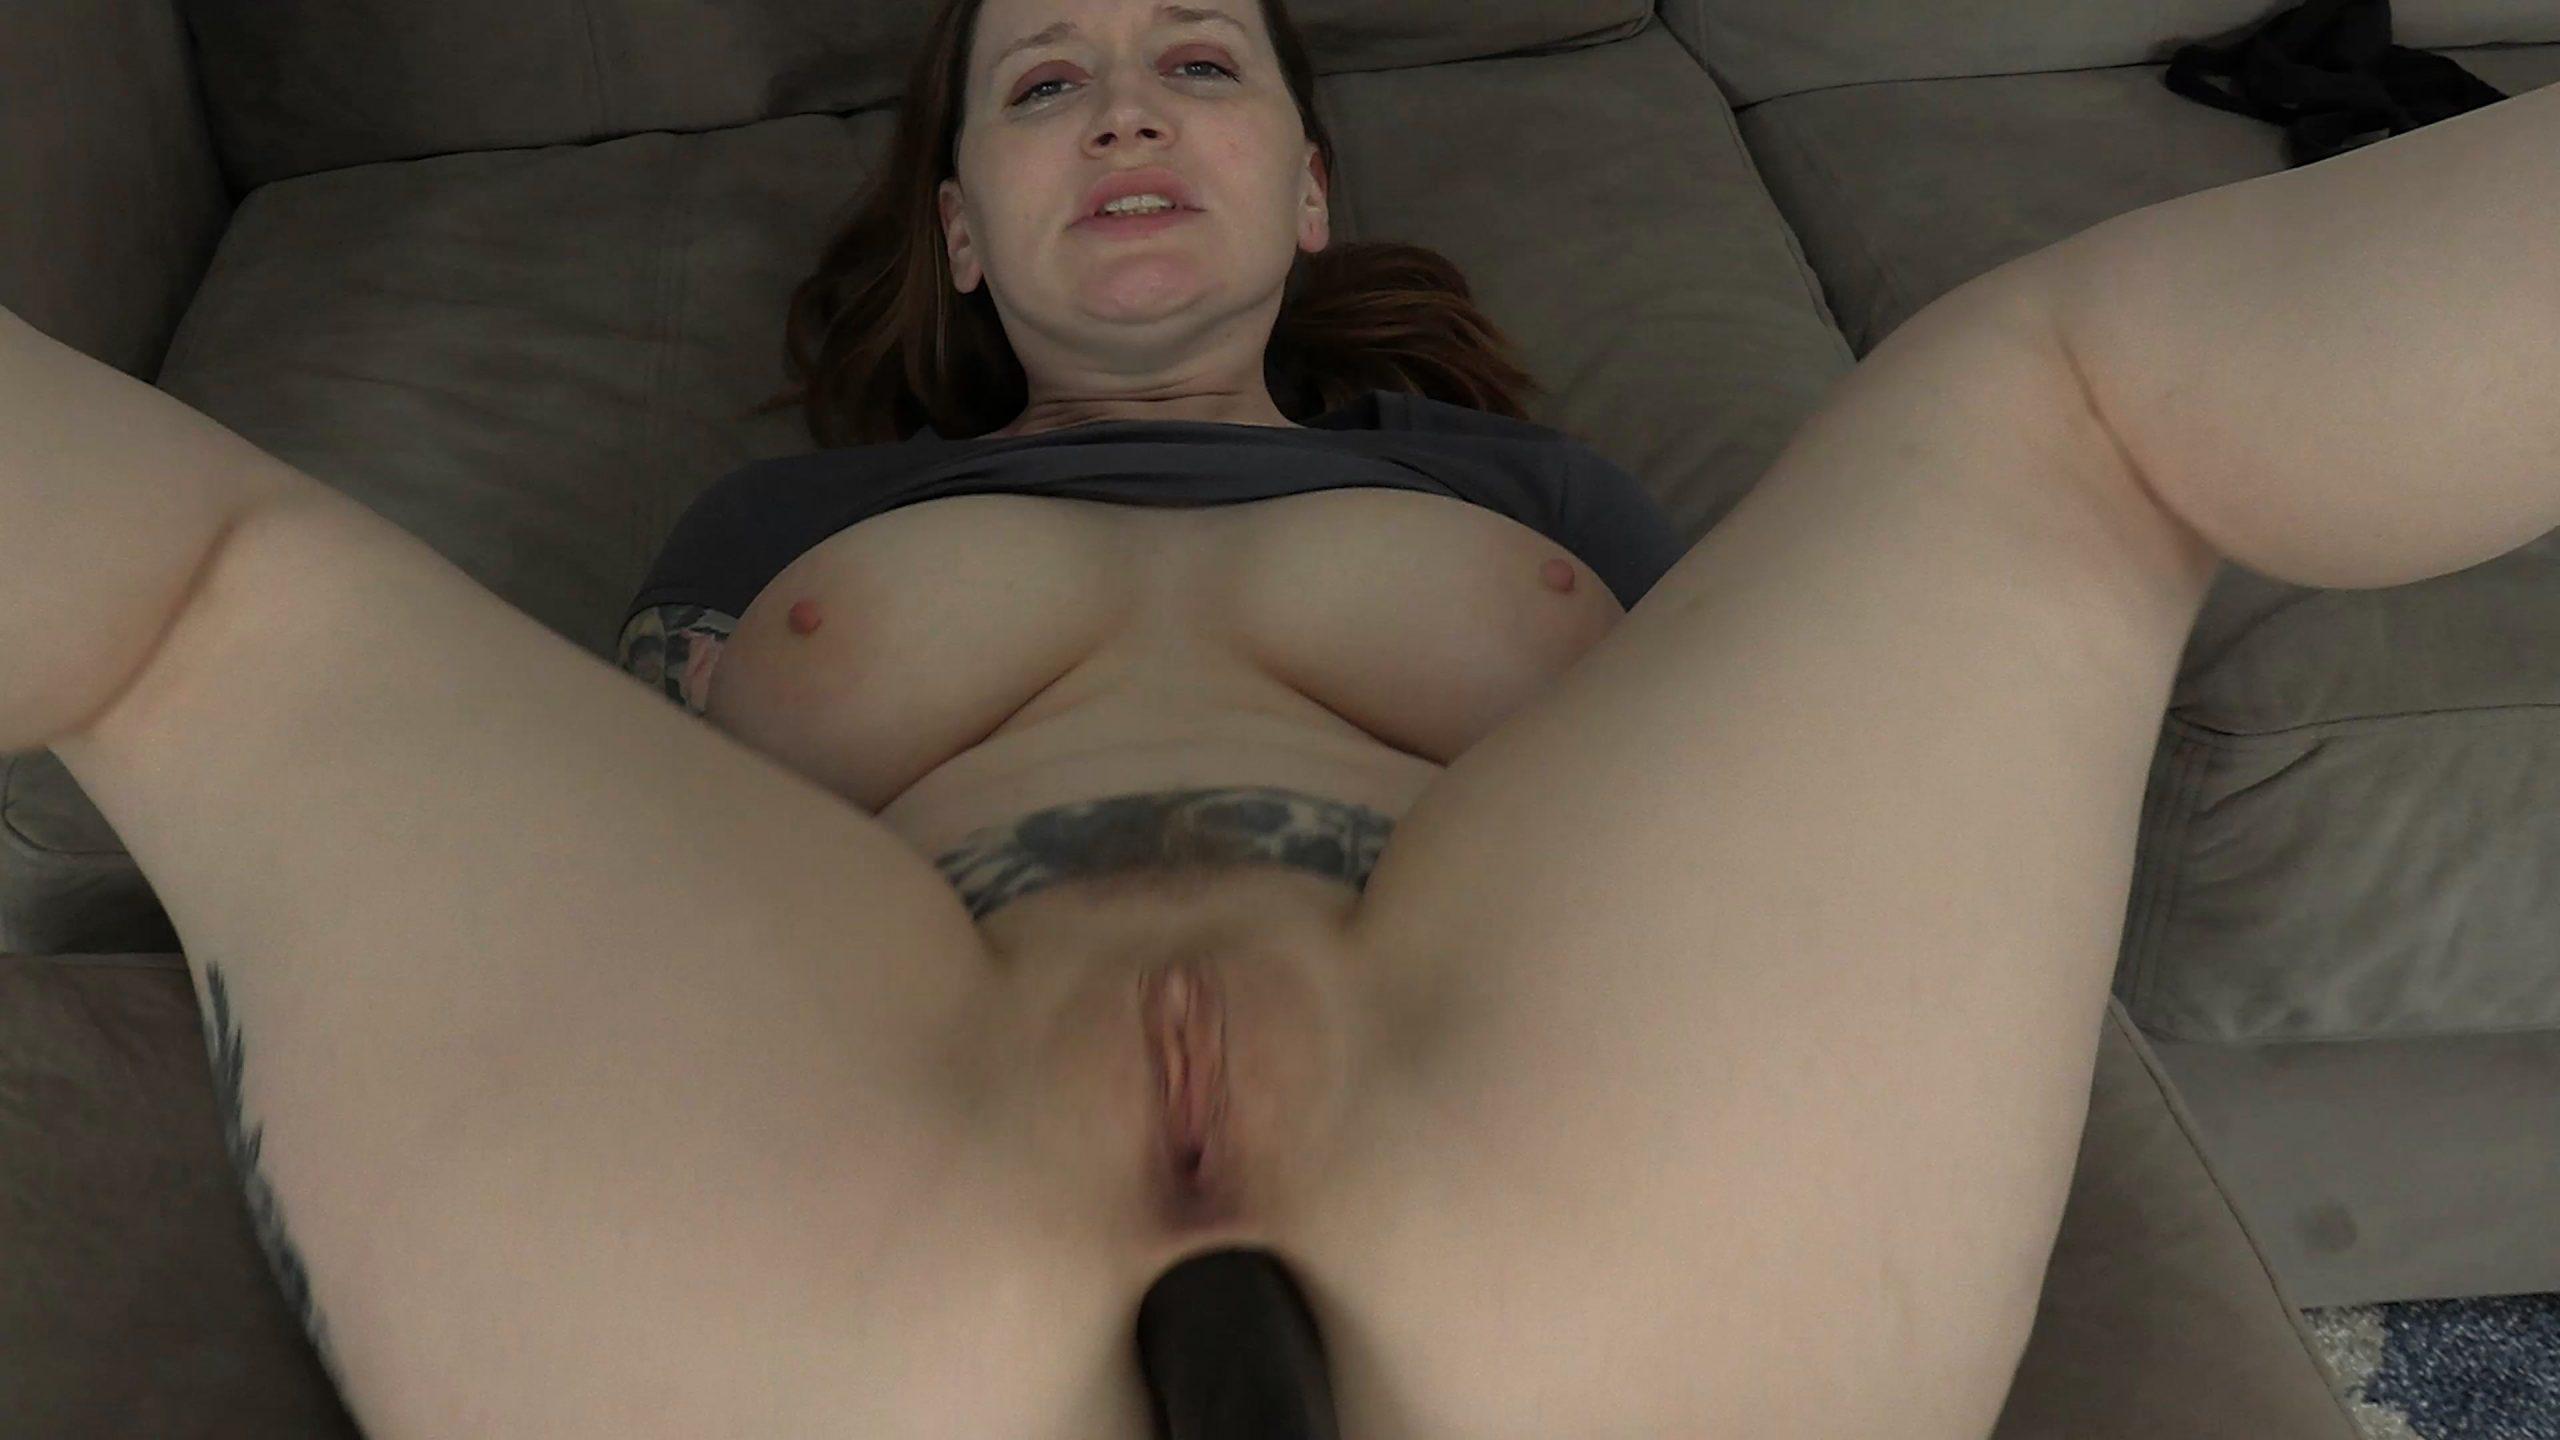 Bettie Bondage - Sperm Addict 4K